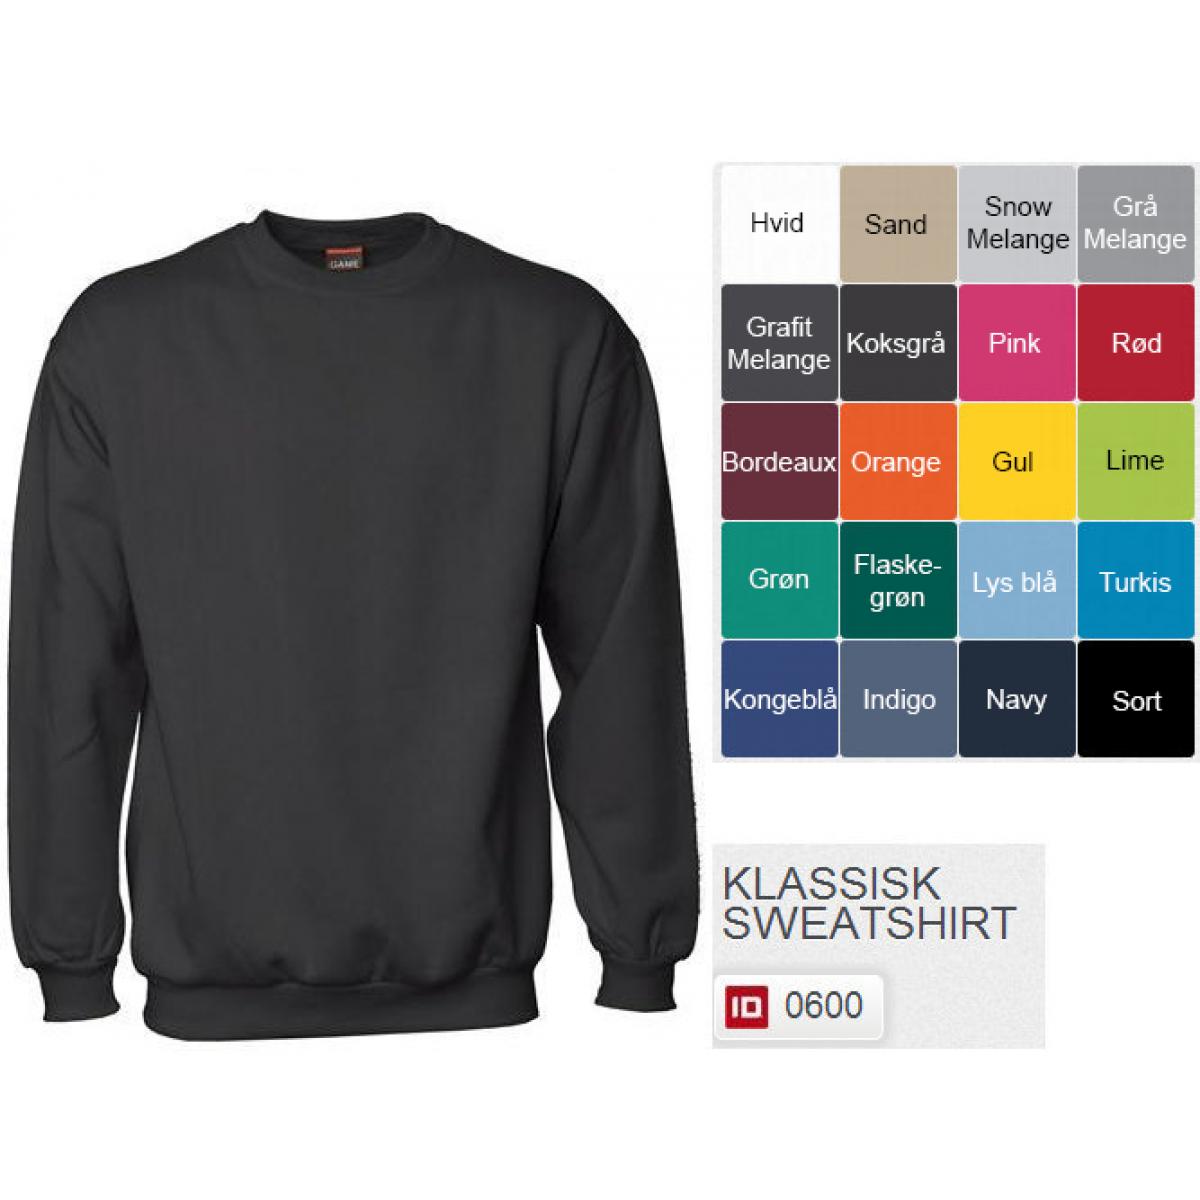 ID Klassisk sweatshirt-31